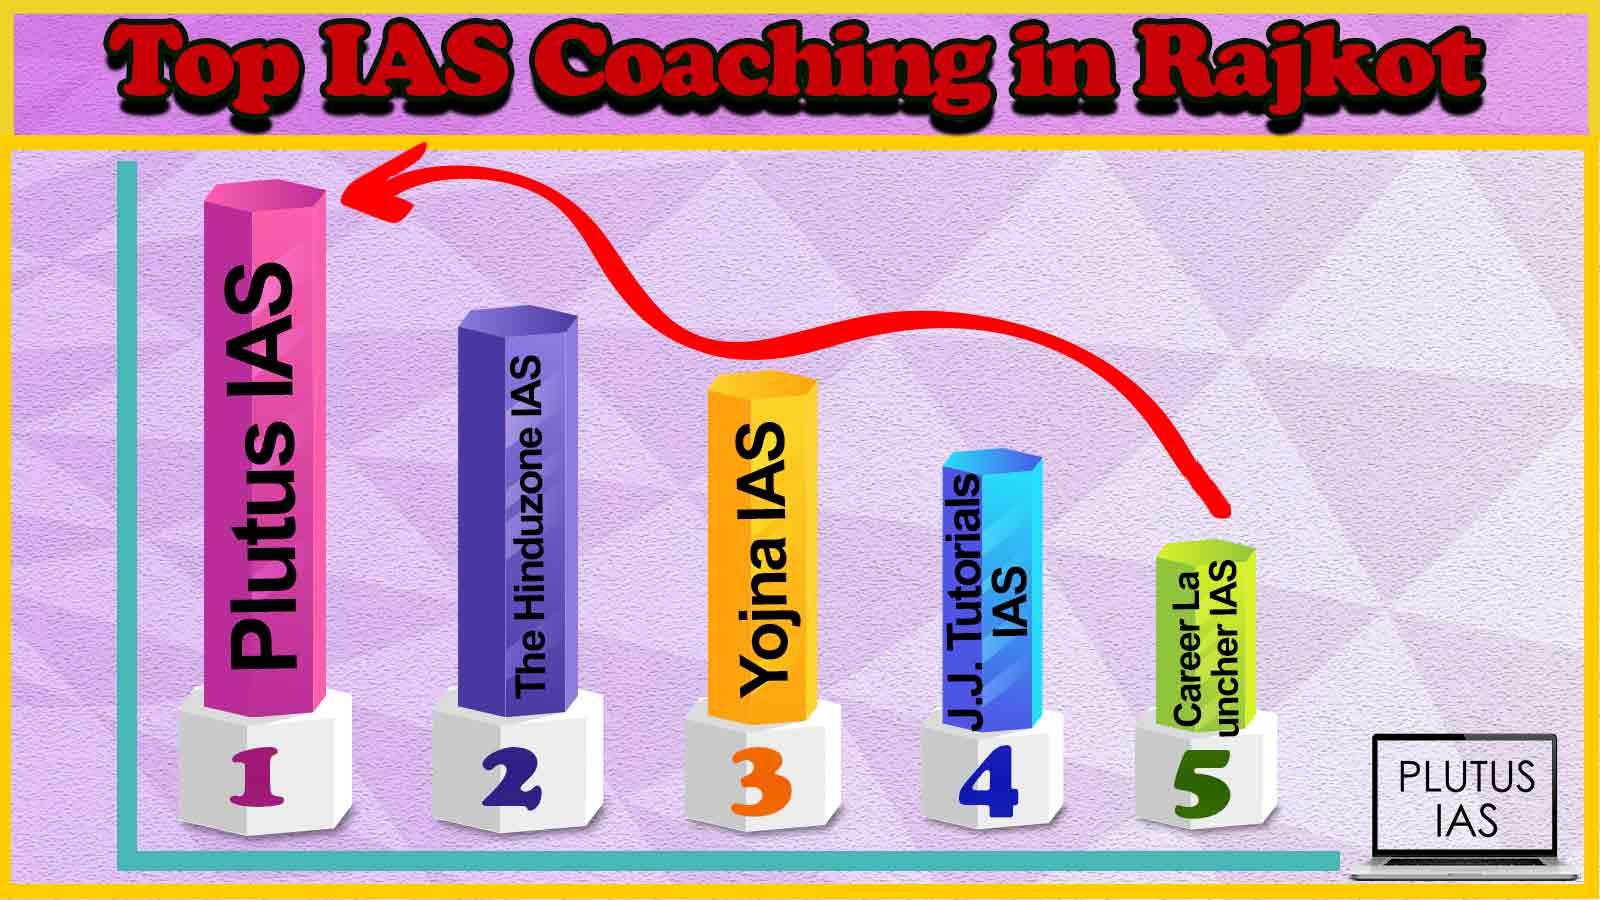 Best 10 IAS Coaching Rajkot